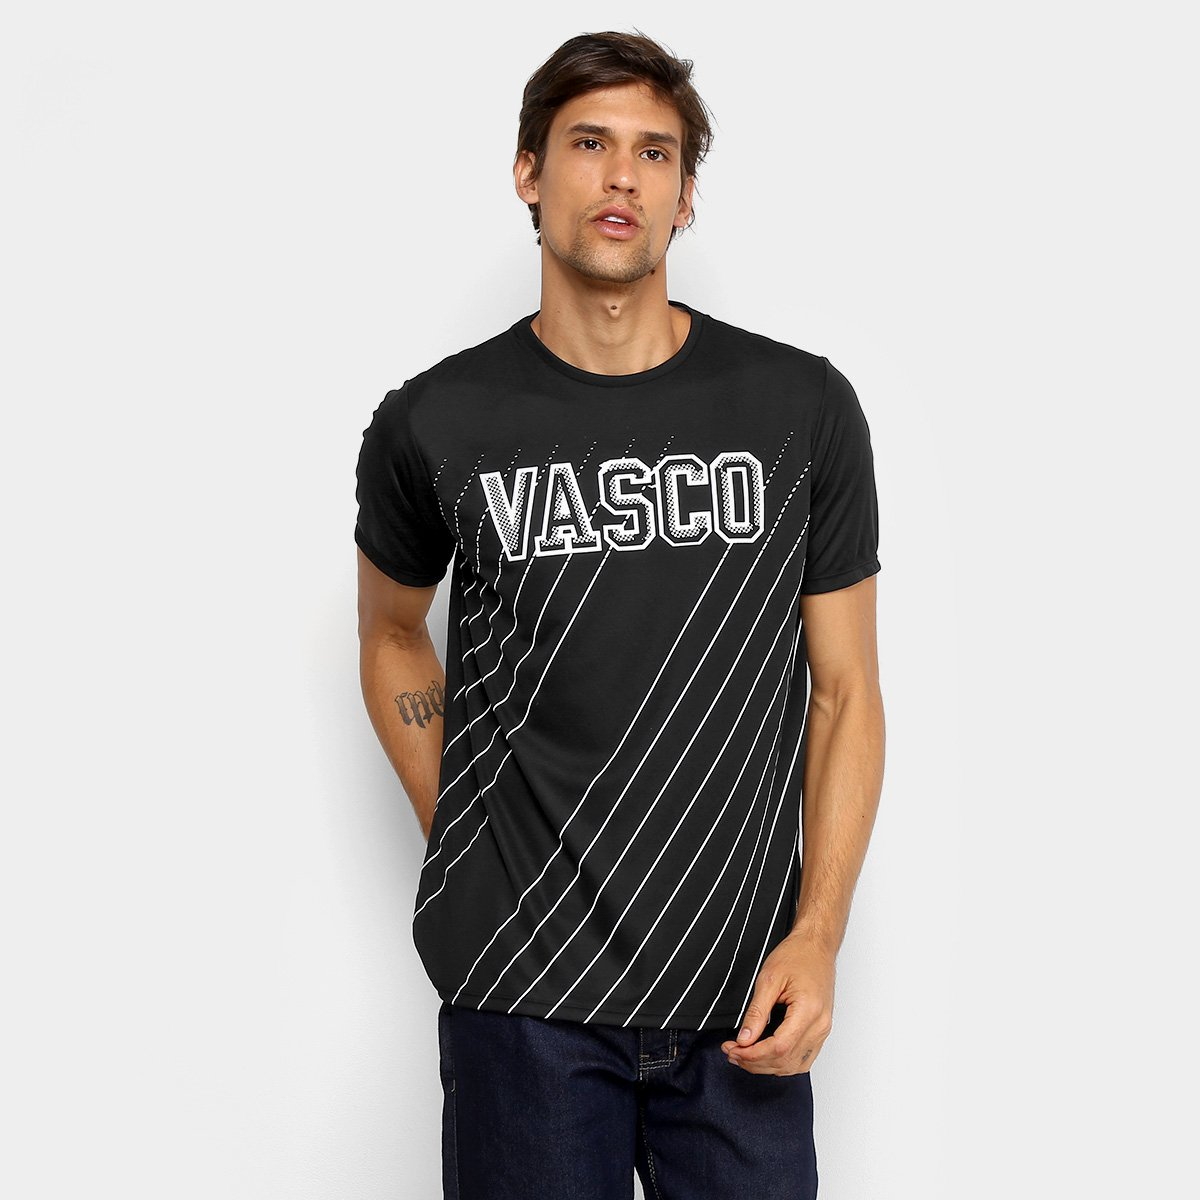 Camiseta Vasco Intus Masculina - Compre Agora  d3f0f2b8a2916